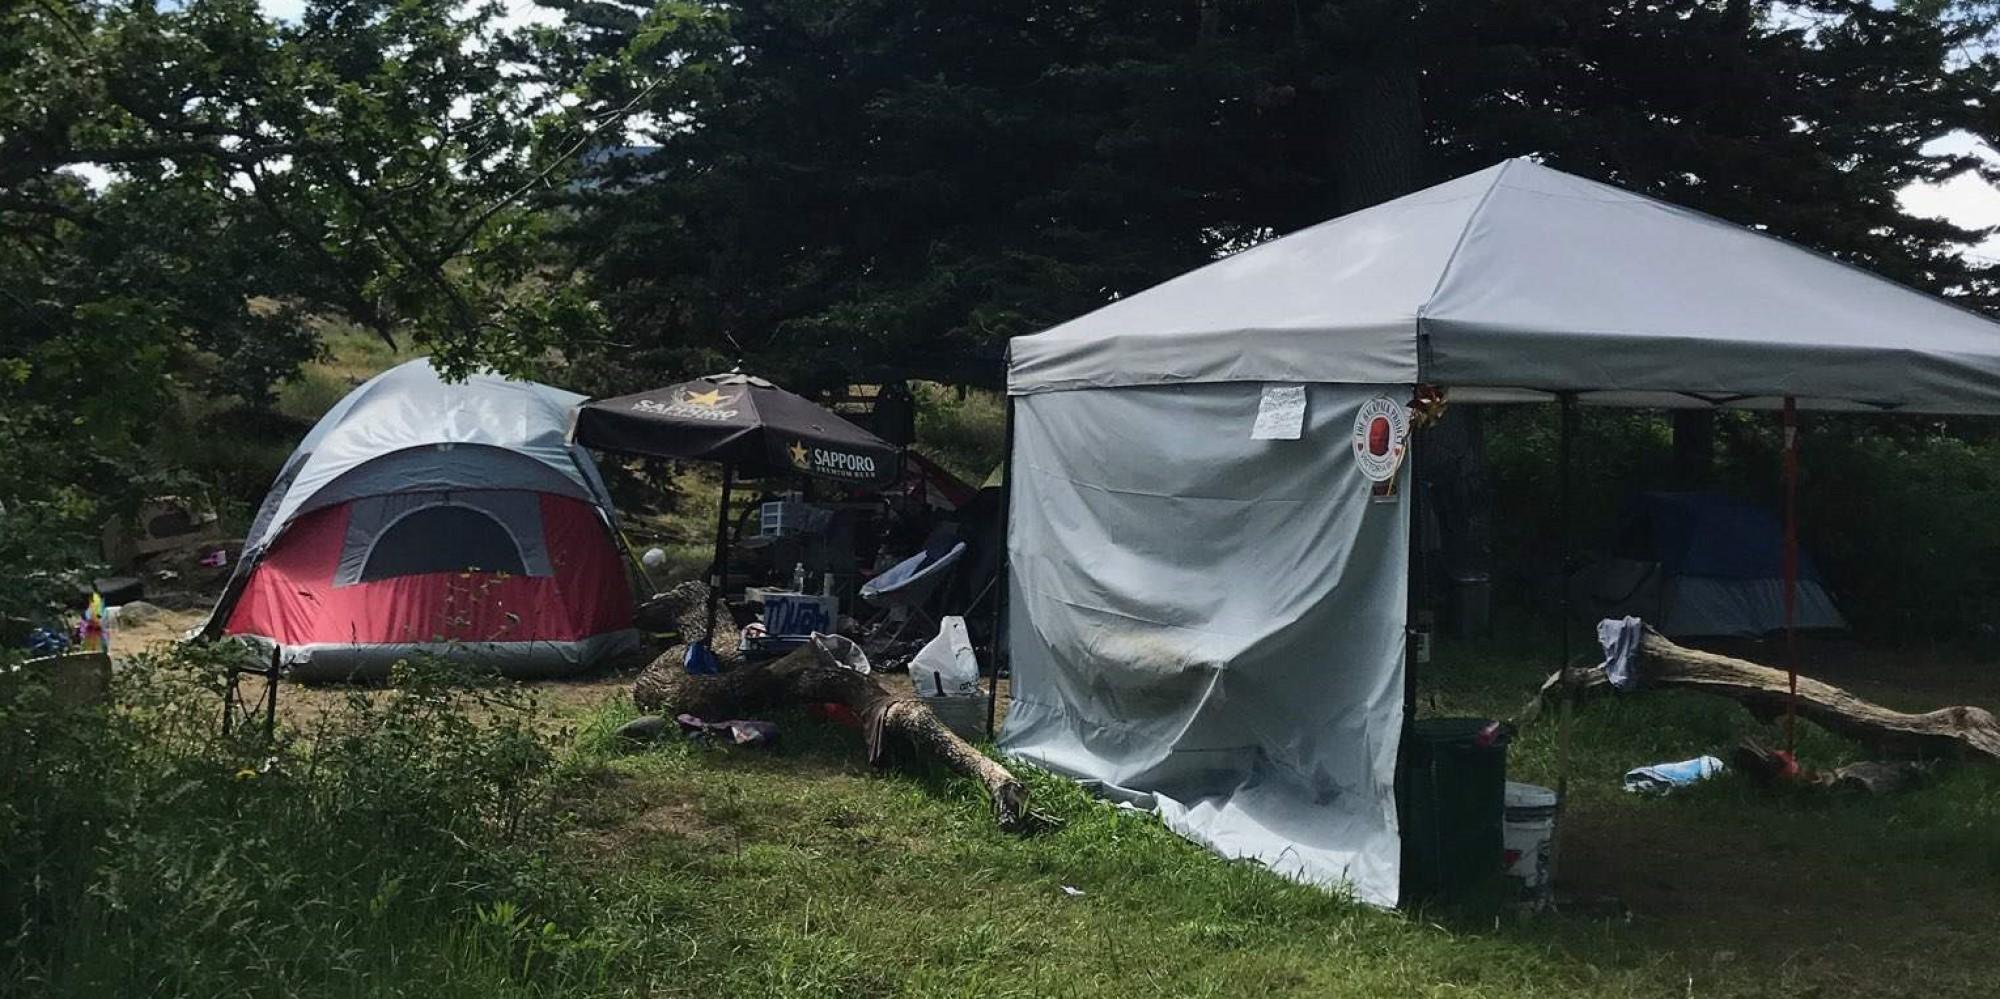 City Worried About Beacon Hill Tent Encampments Hurting Garry Oaks, Lekwungen Sites